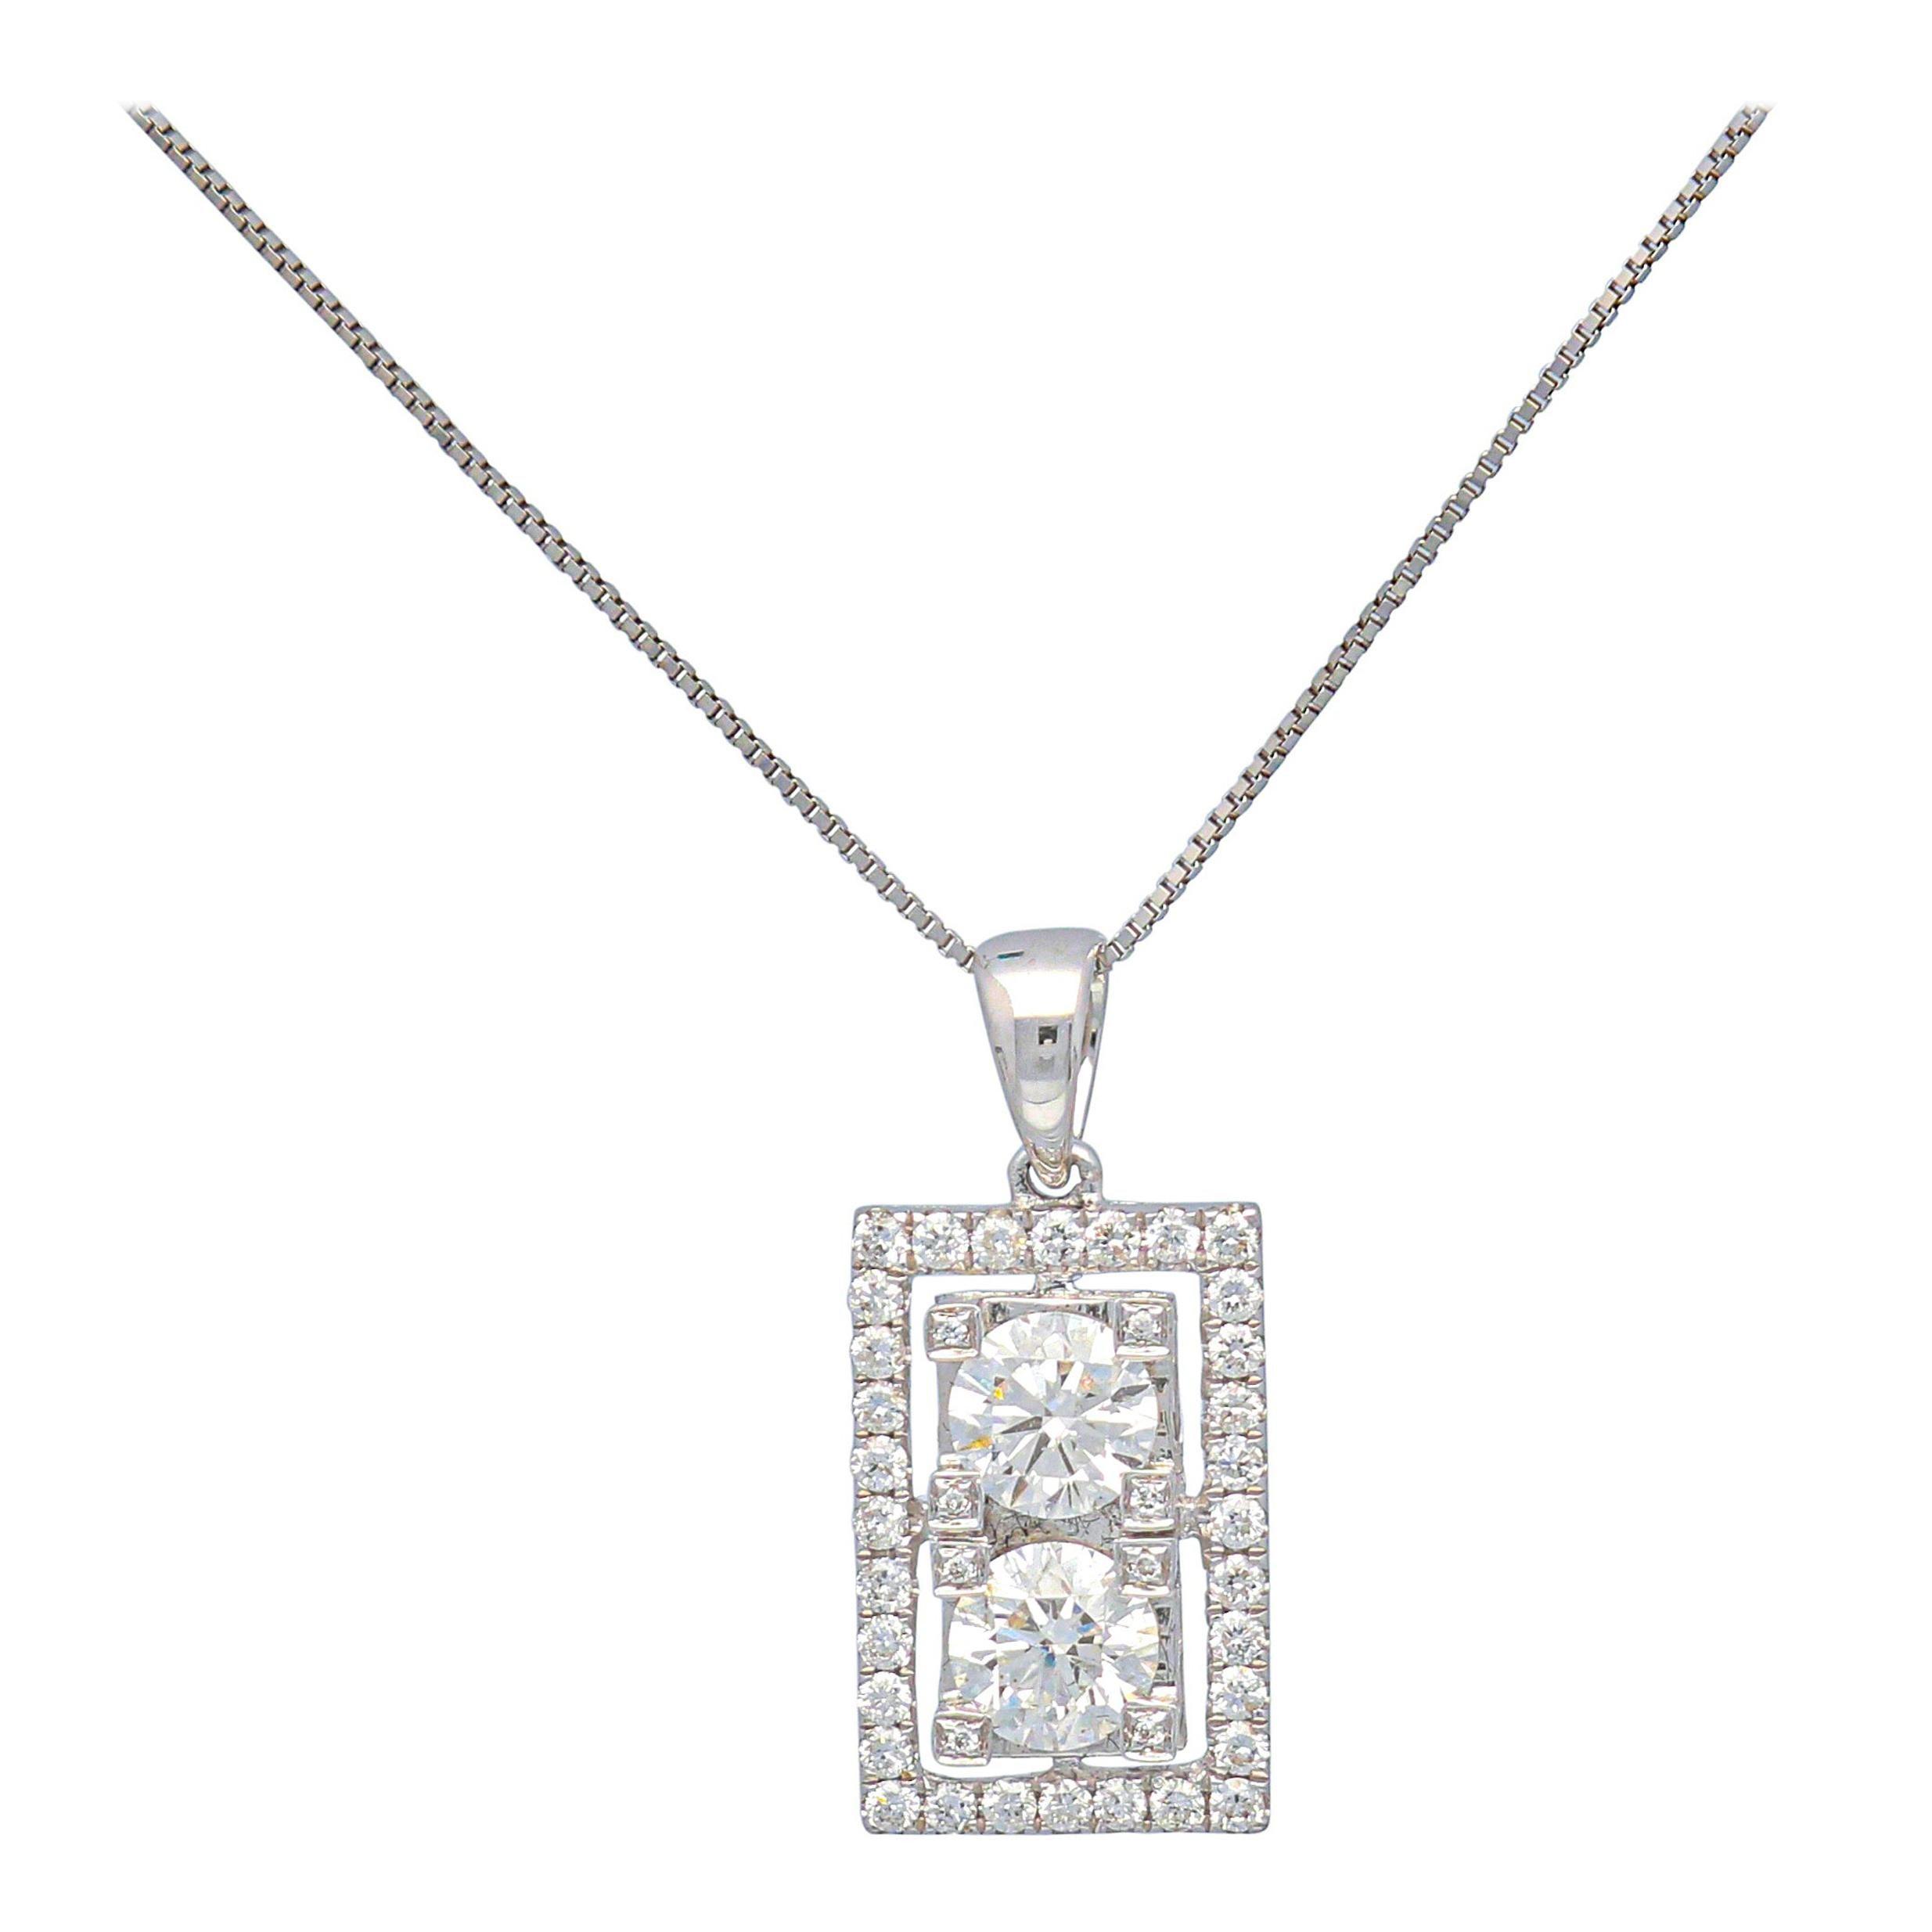 1.36 Carat Round Diamond 18k White Gold Pendant